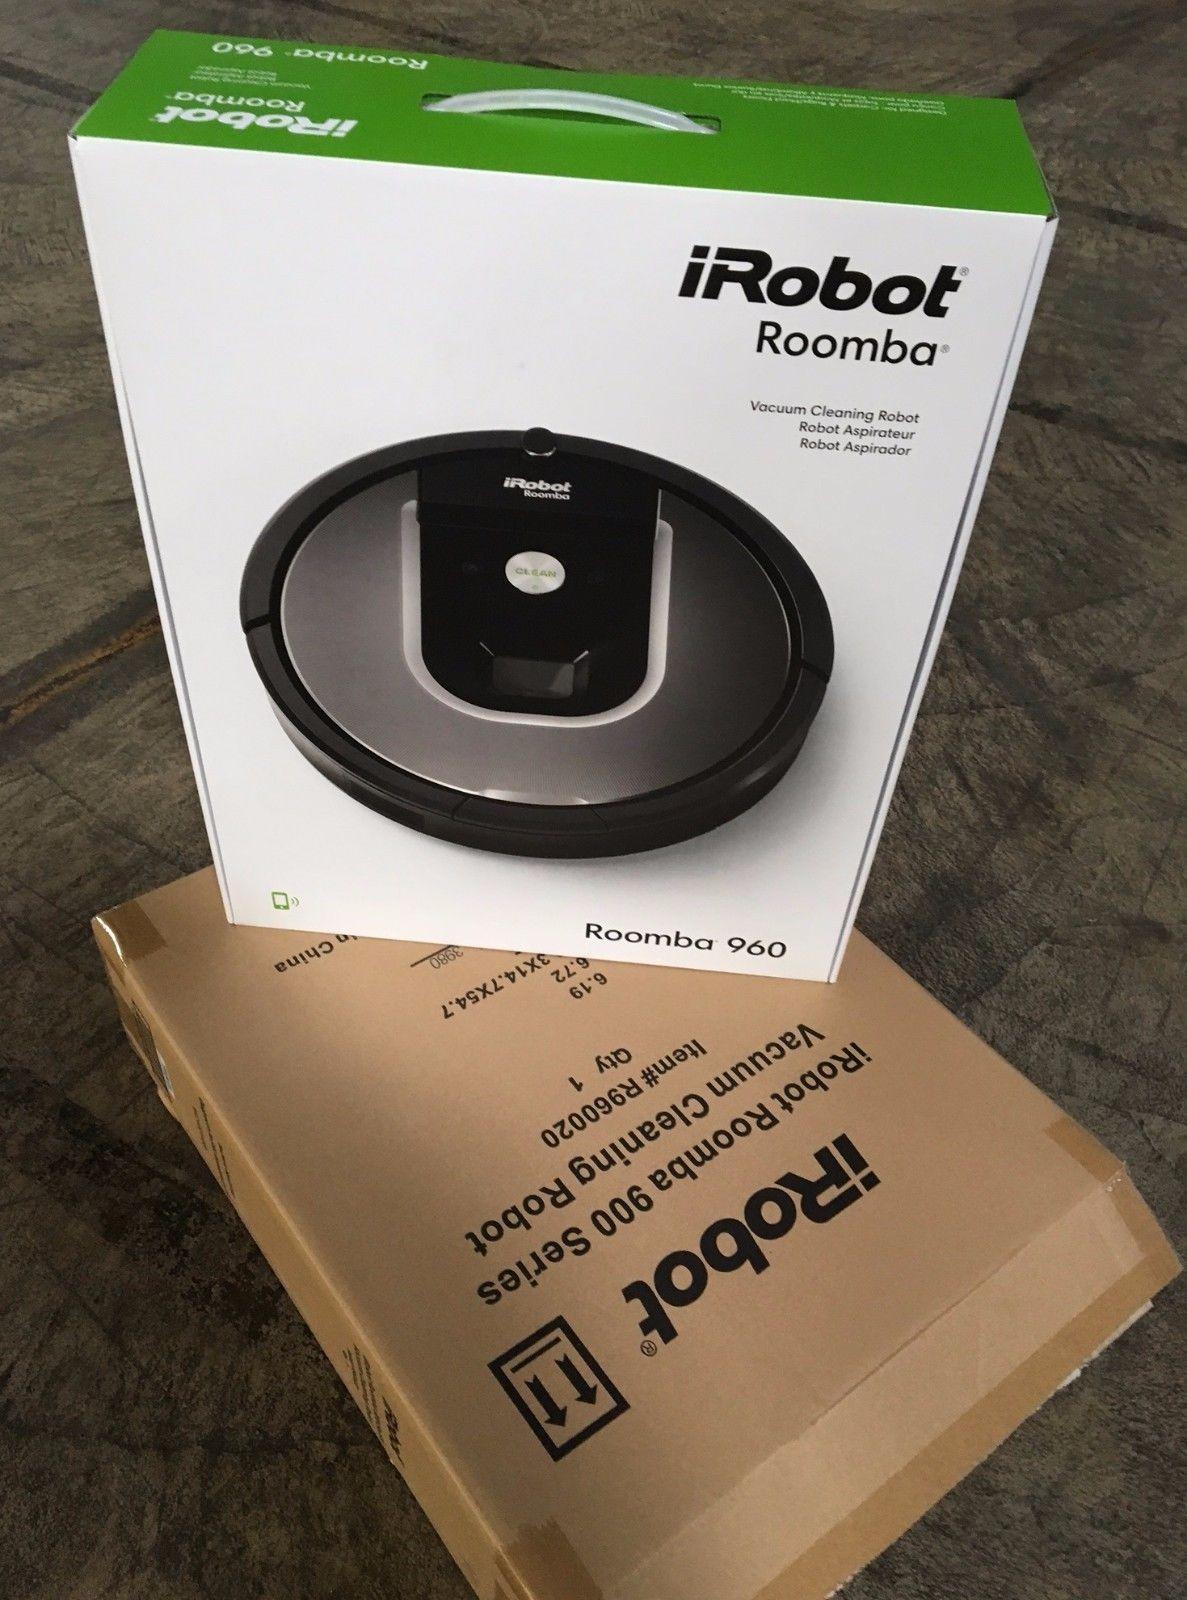 Robot Roomba Vacuum Cleaning Robot Pet R980020 Brand